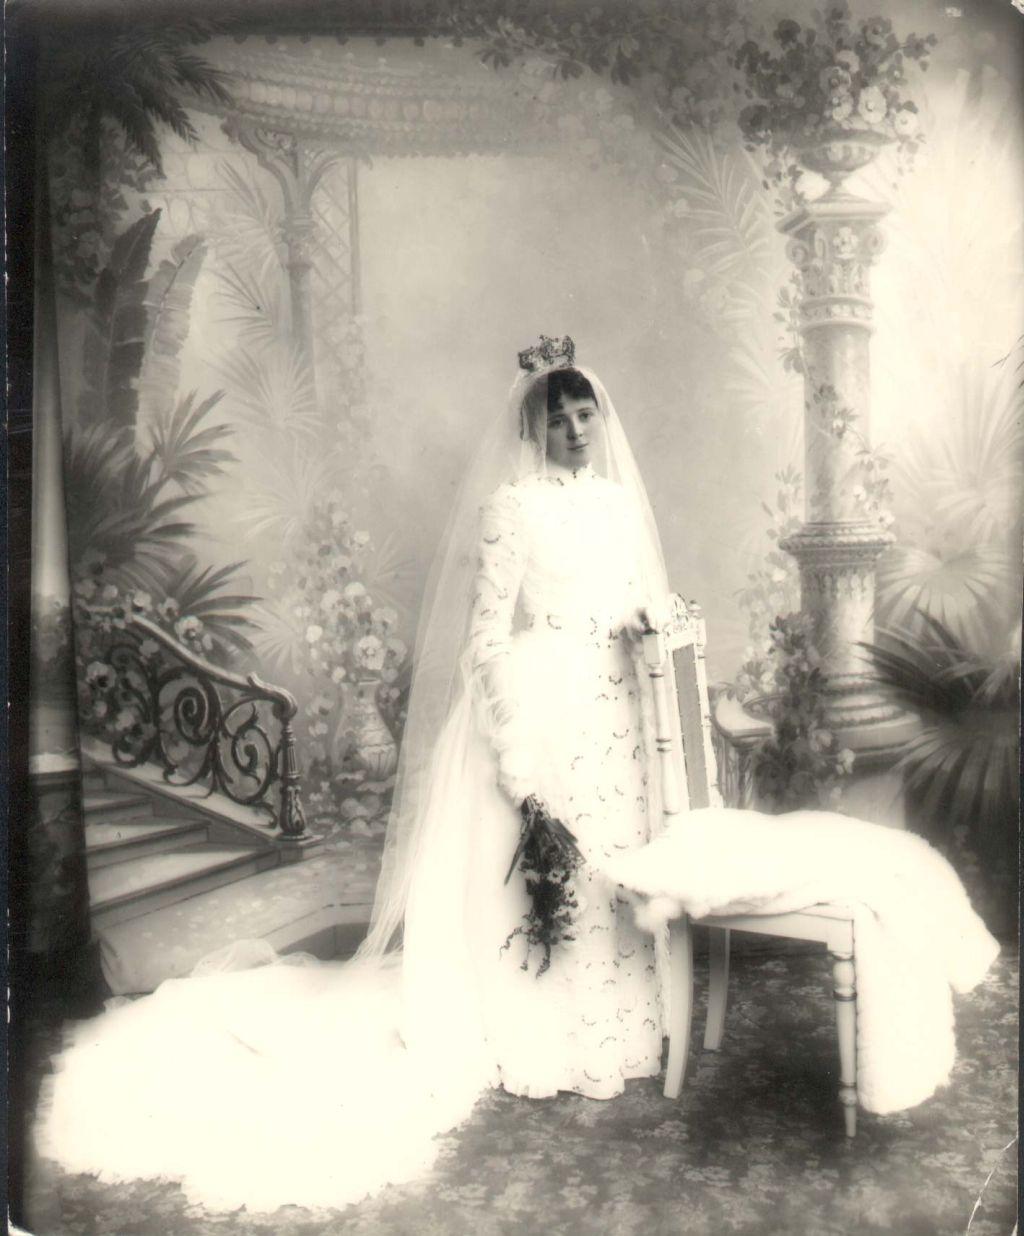 Victor Lind, Marta Leimann st�r brud,